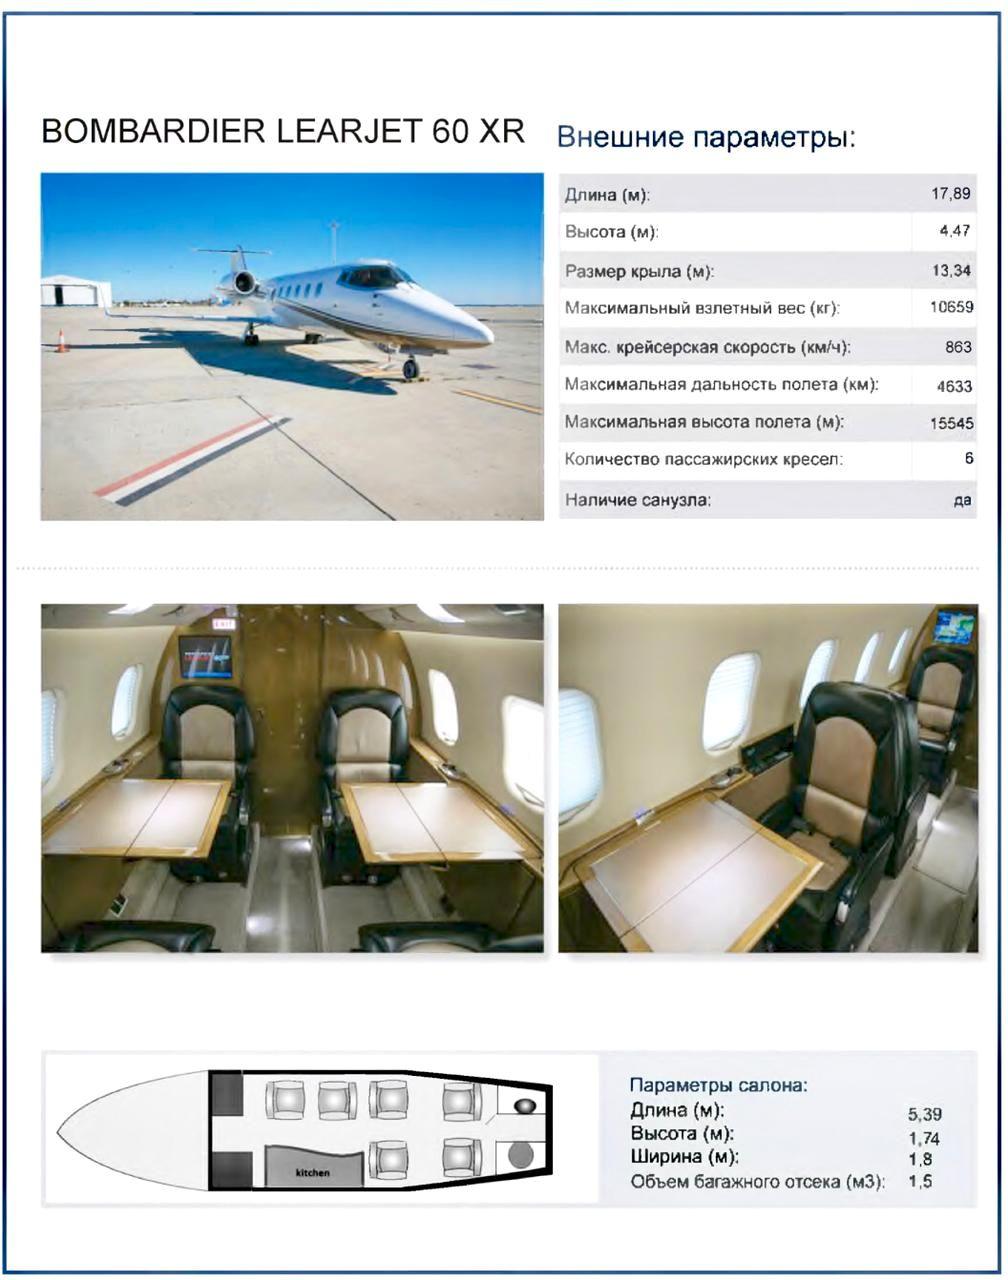 BOMBARDIER LEARJET 60 XR арендовать частный самолет